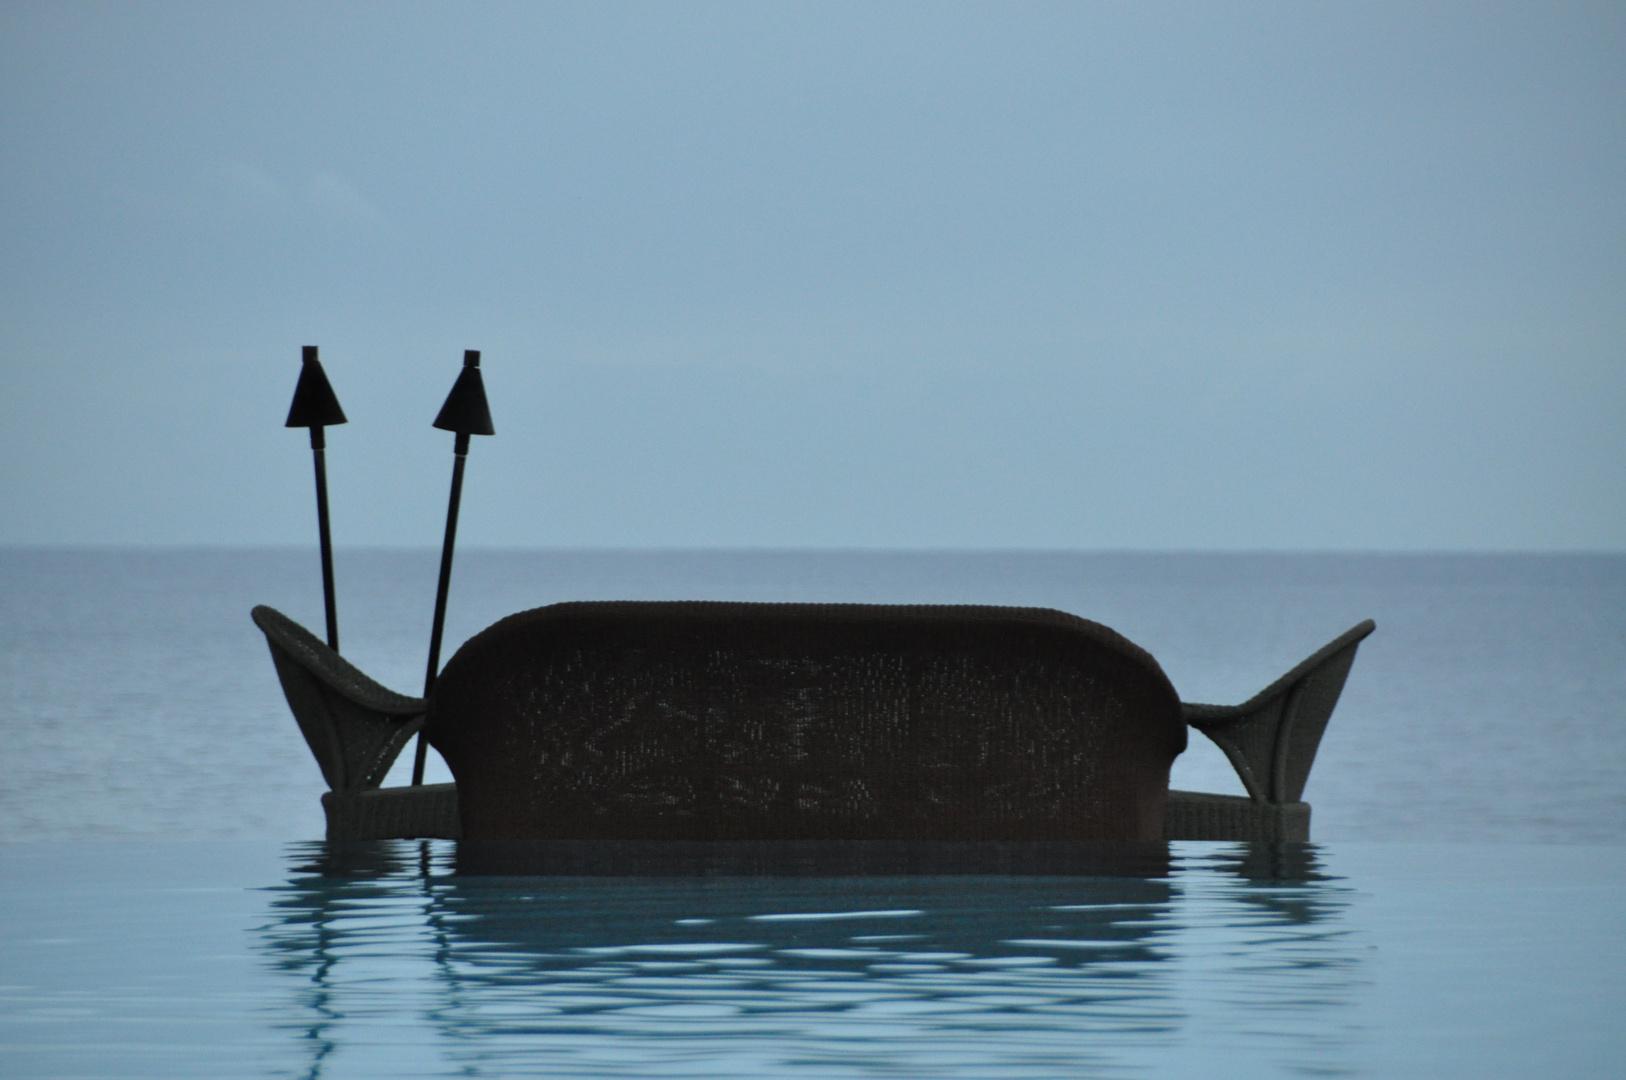 Una panchina sul mare